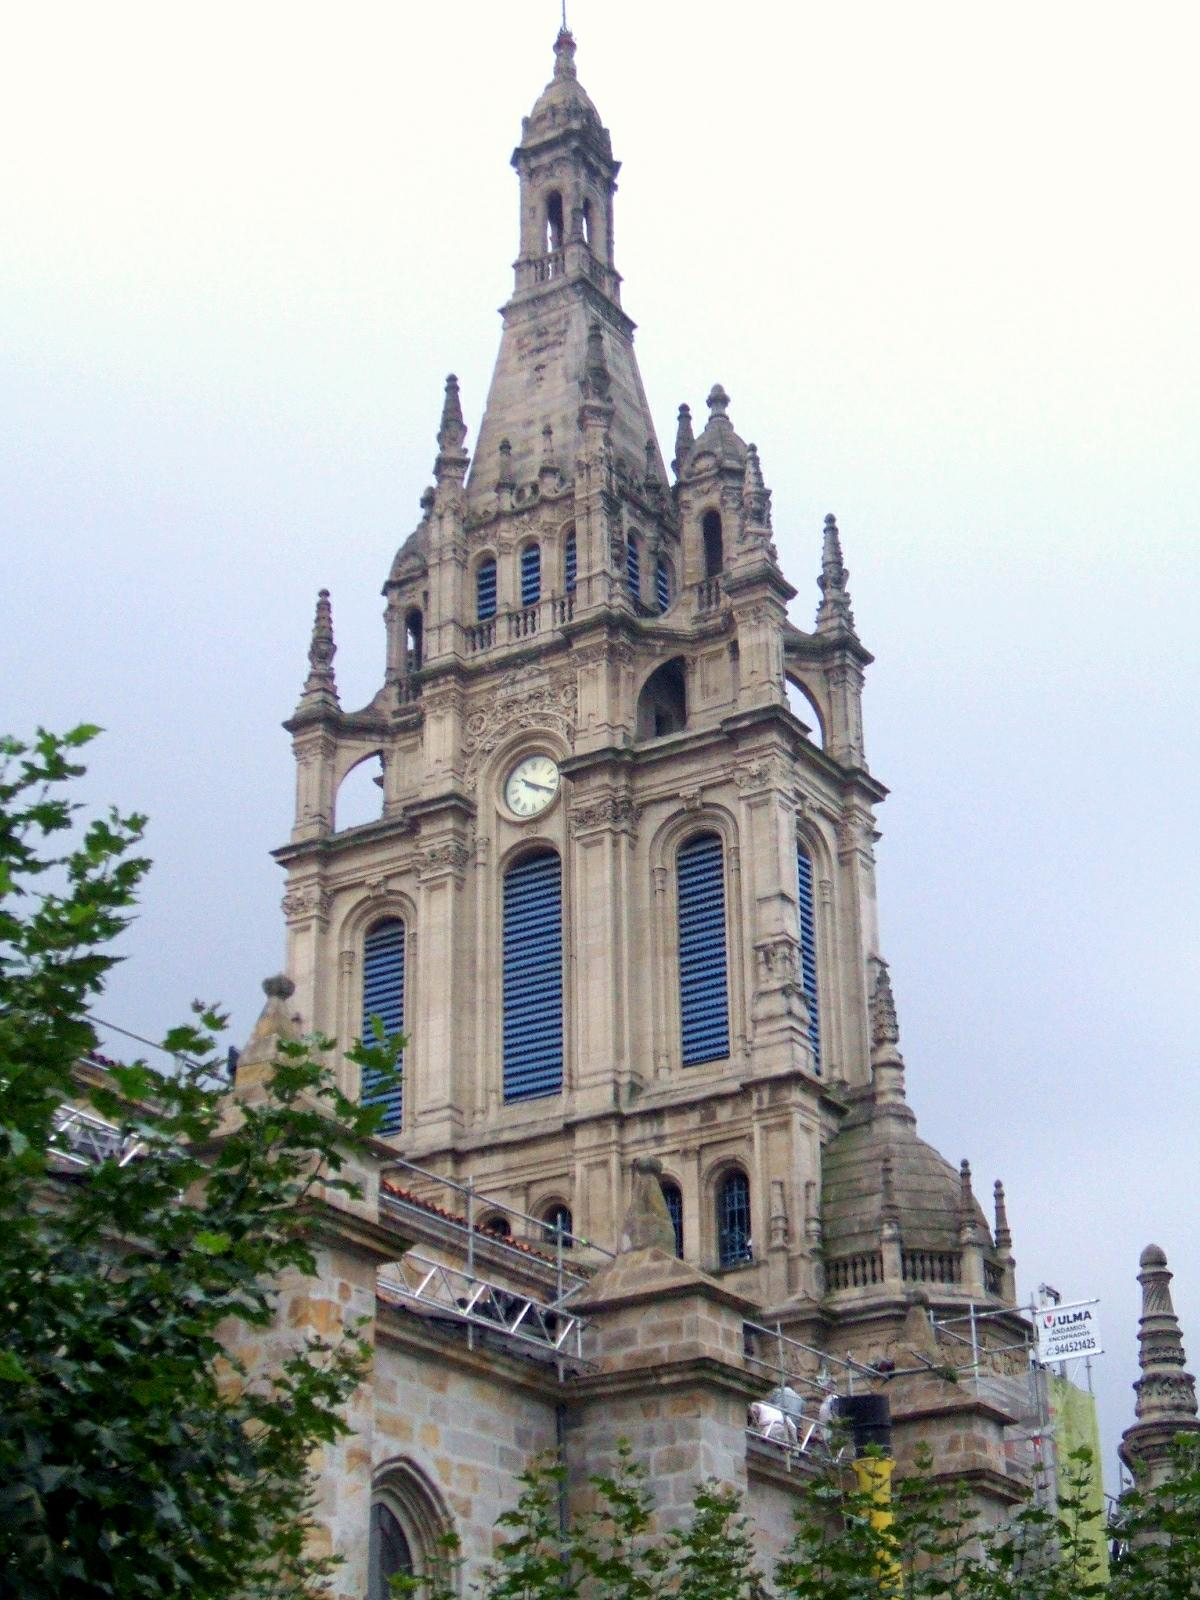 https://upload.wikimedia.org/wikipedia/commons/4/4c/Bilbao_-_Basilica_de_Bego%C3%B1a_12.JPG